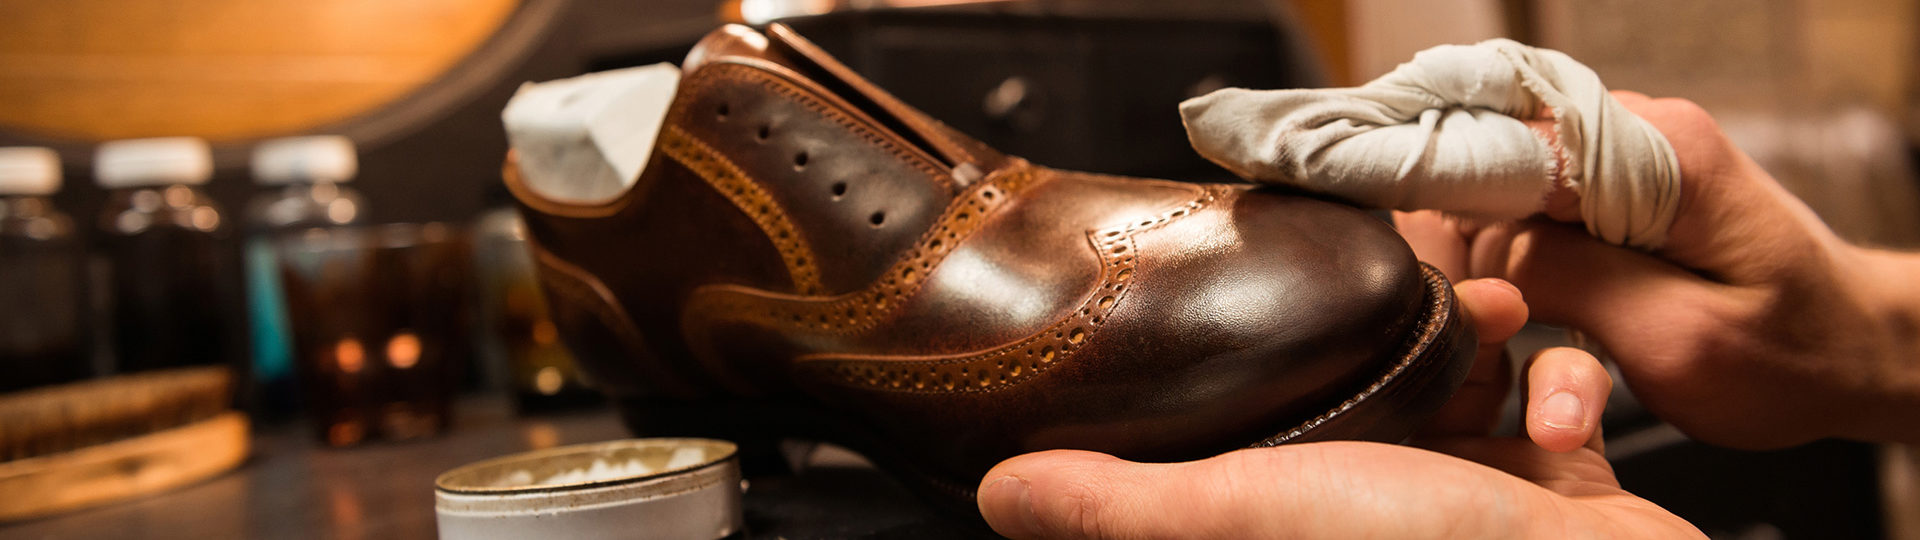 Reichl Schuhe Shop